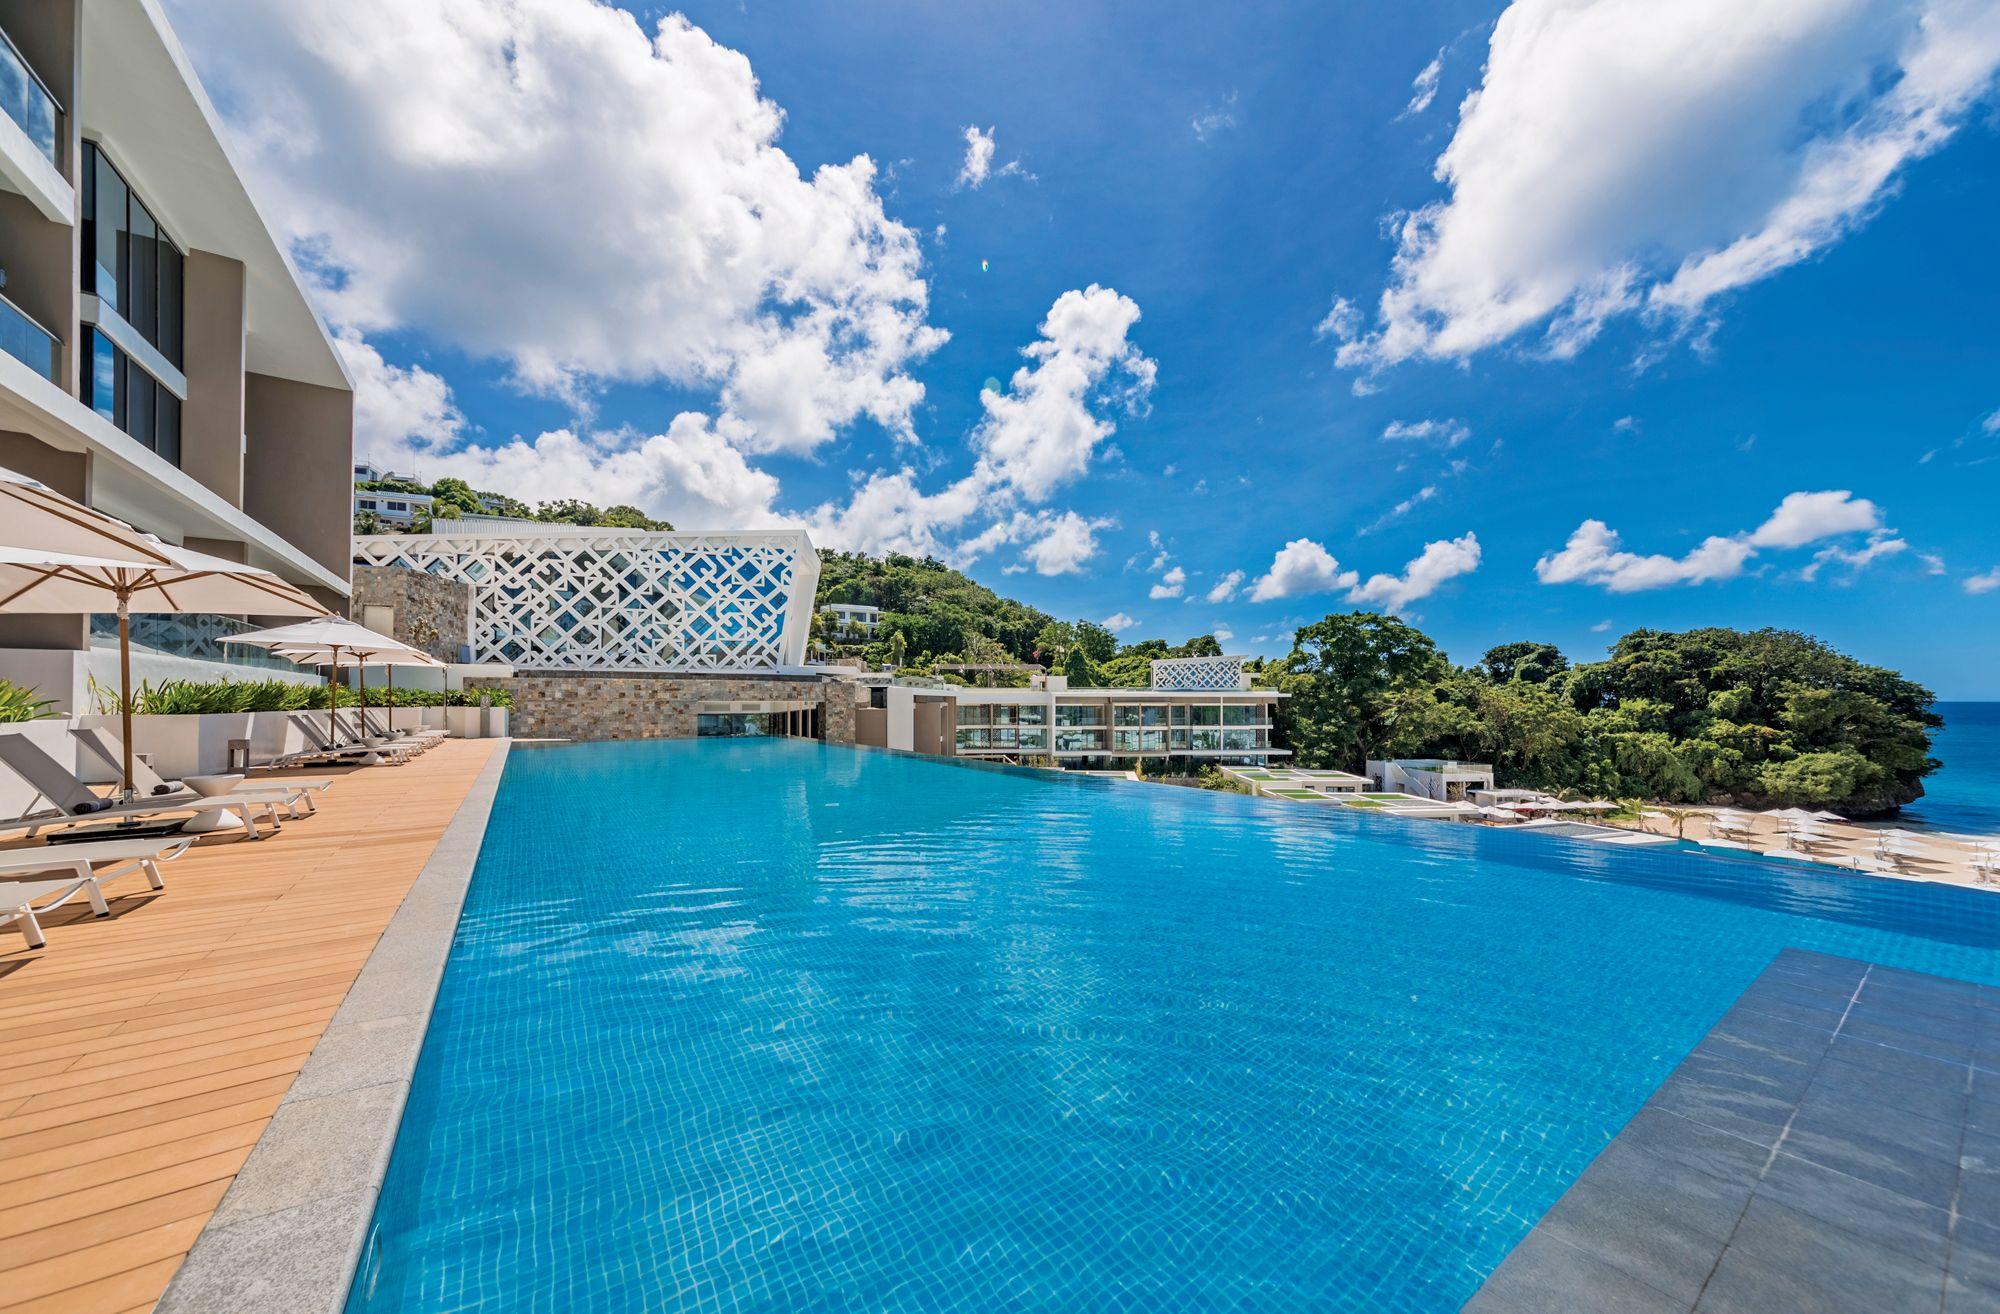 Where Serenity Awaits: Crimson Resort and Spa Boracay